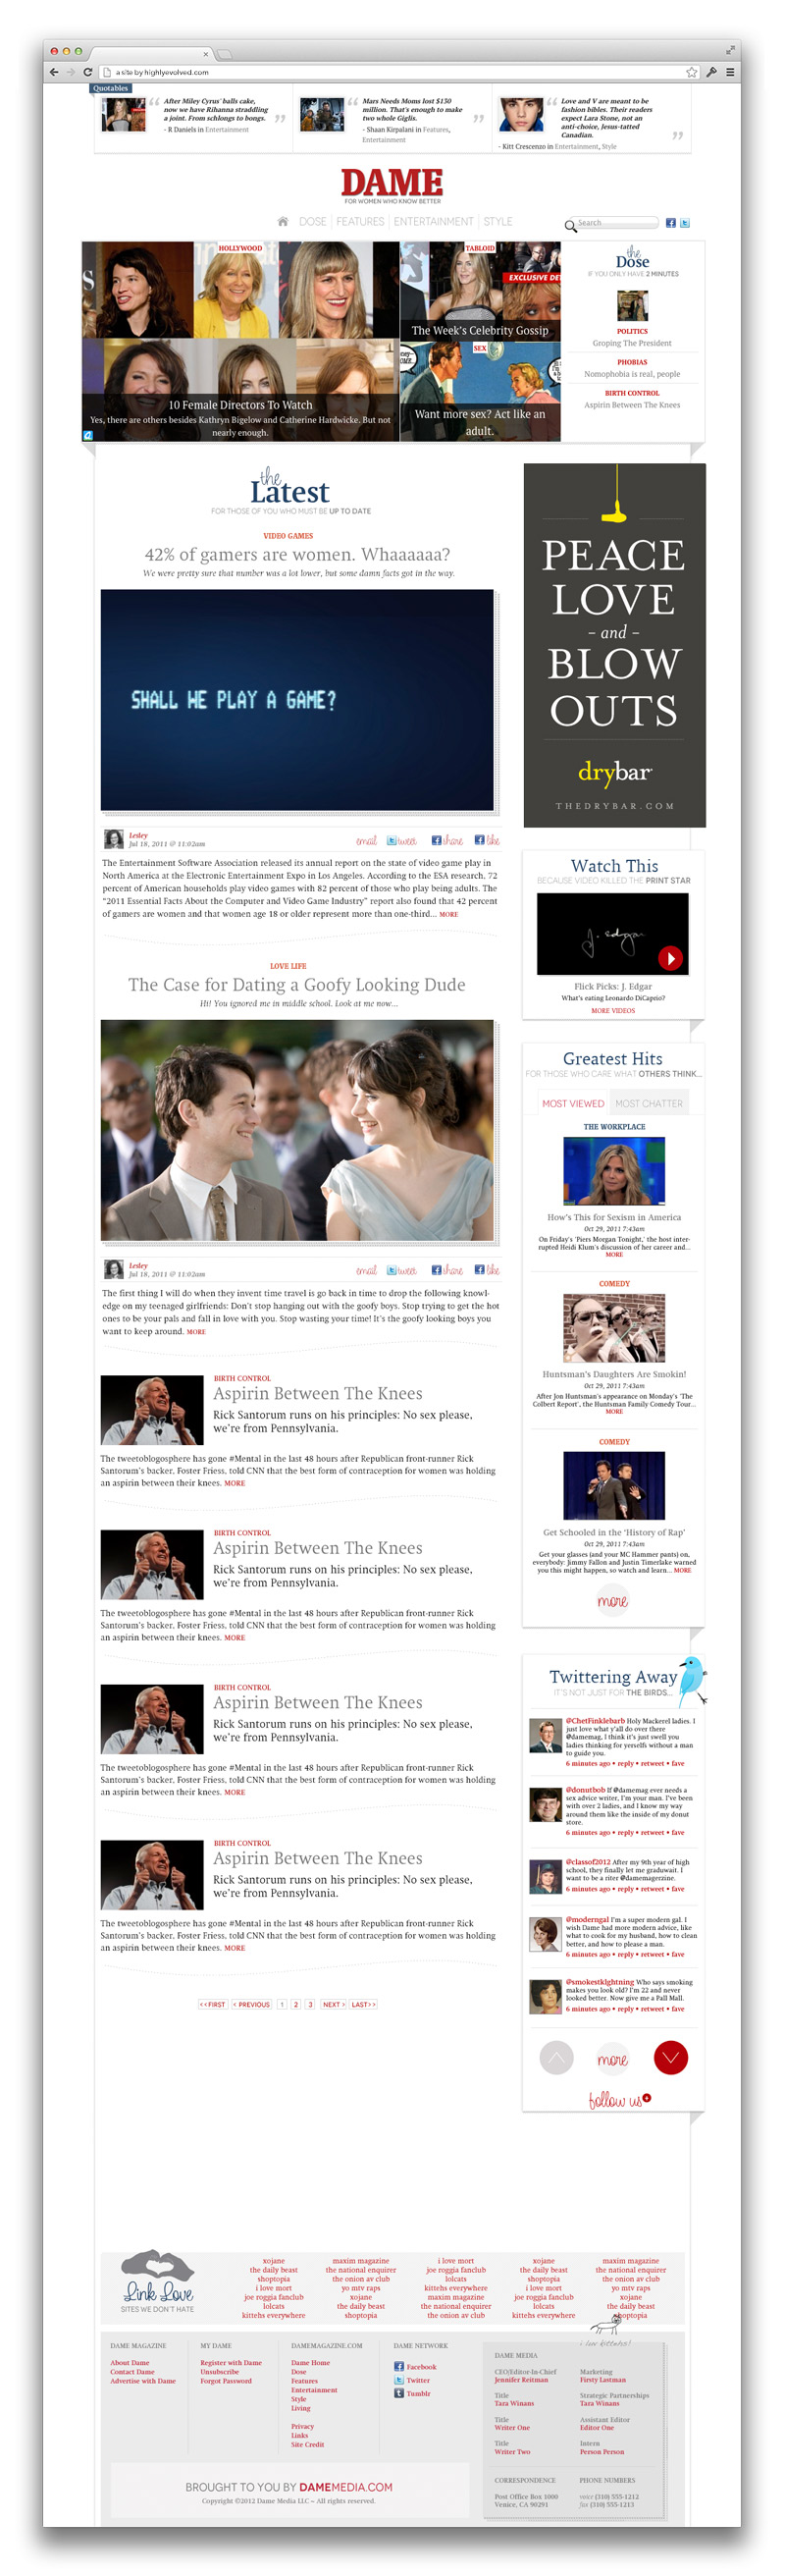 Dame Magazine Homepage